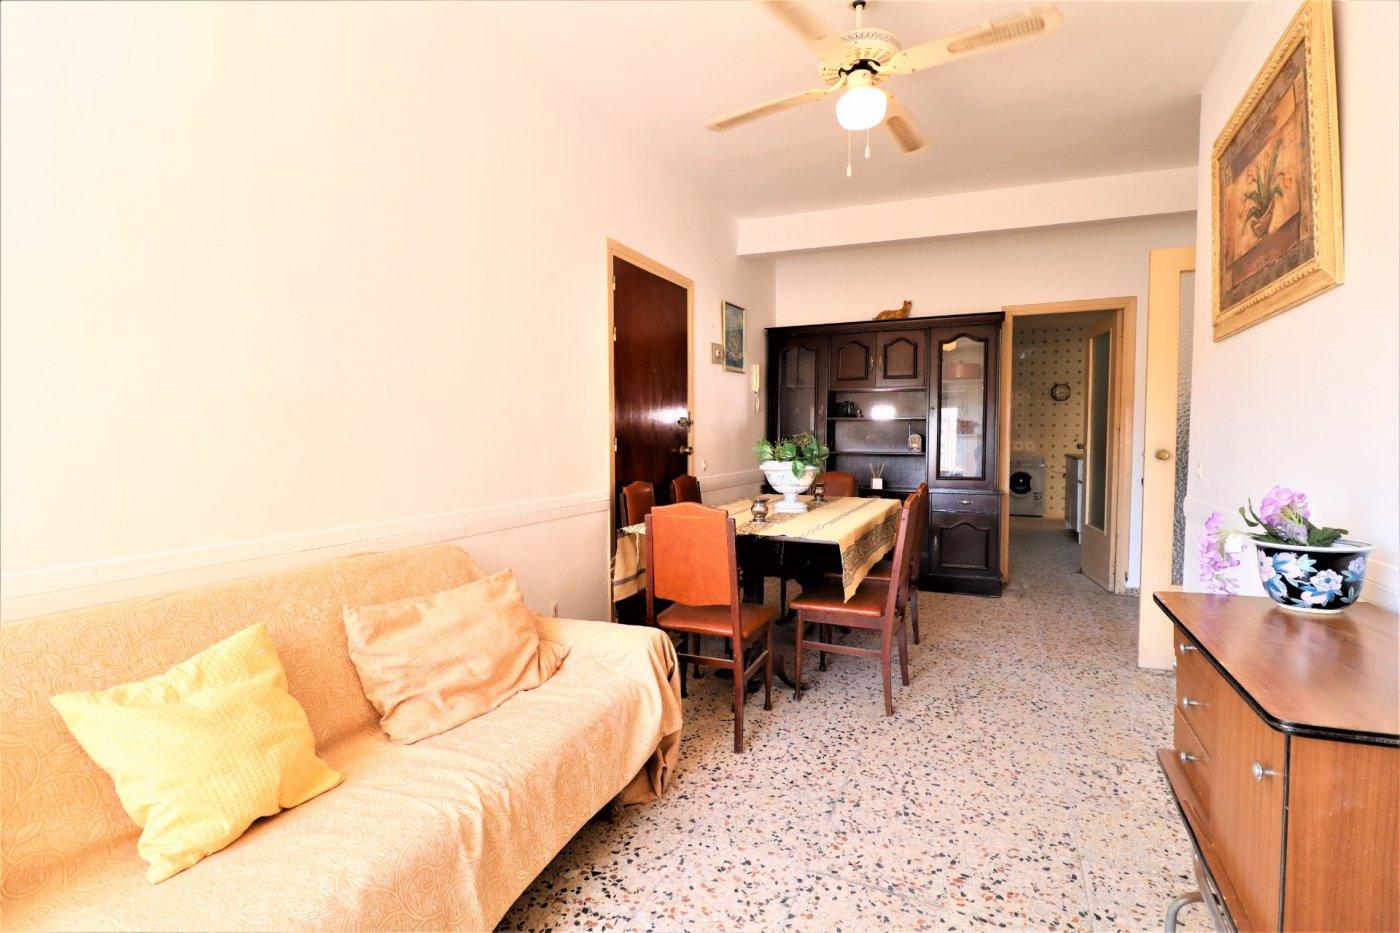 Ground Floor Apartment for sale in Centro, Los Alcazares